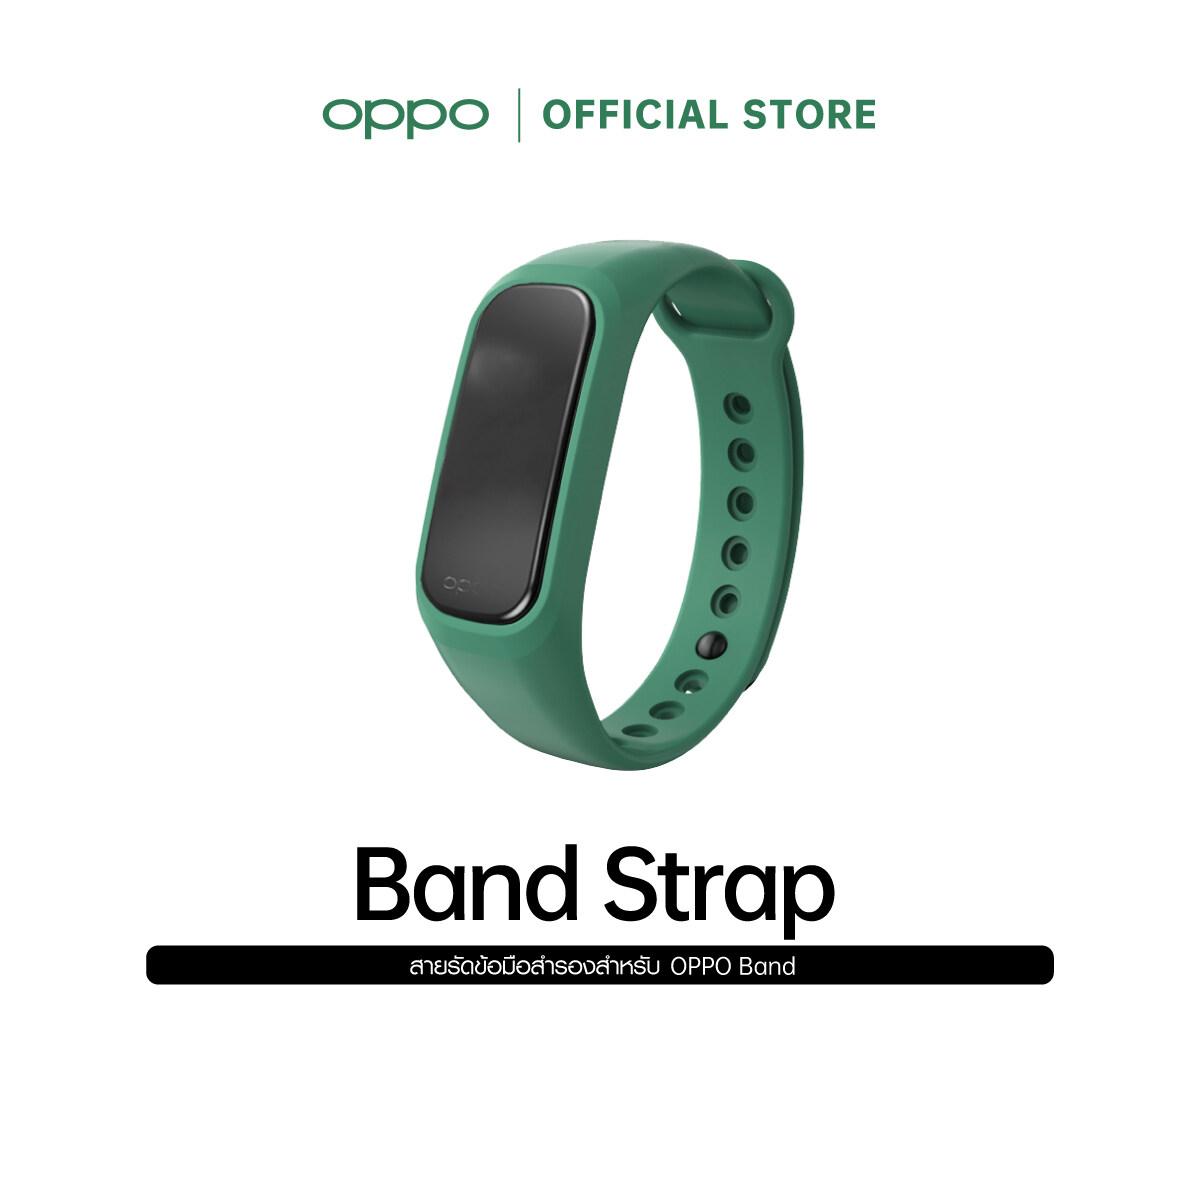 Band Strap สายรัดข้อมือสำรองสำหรับ OPPO Band *เฉพาะสายเท่านั้น*